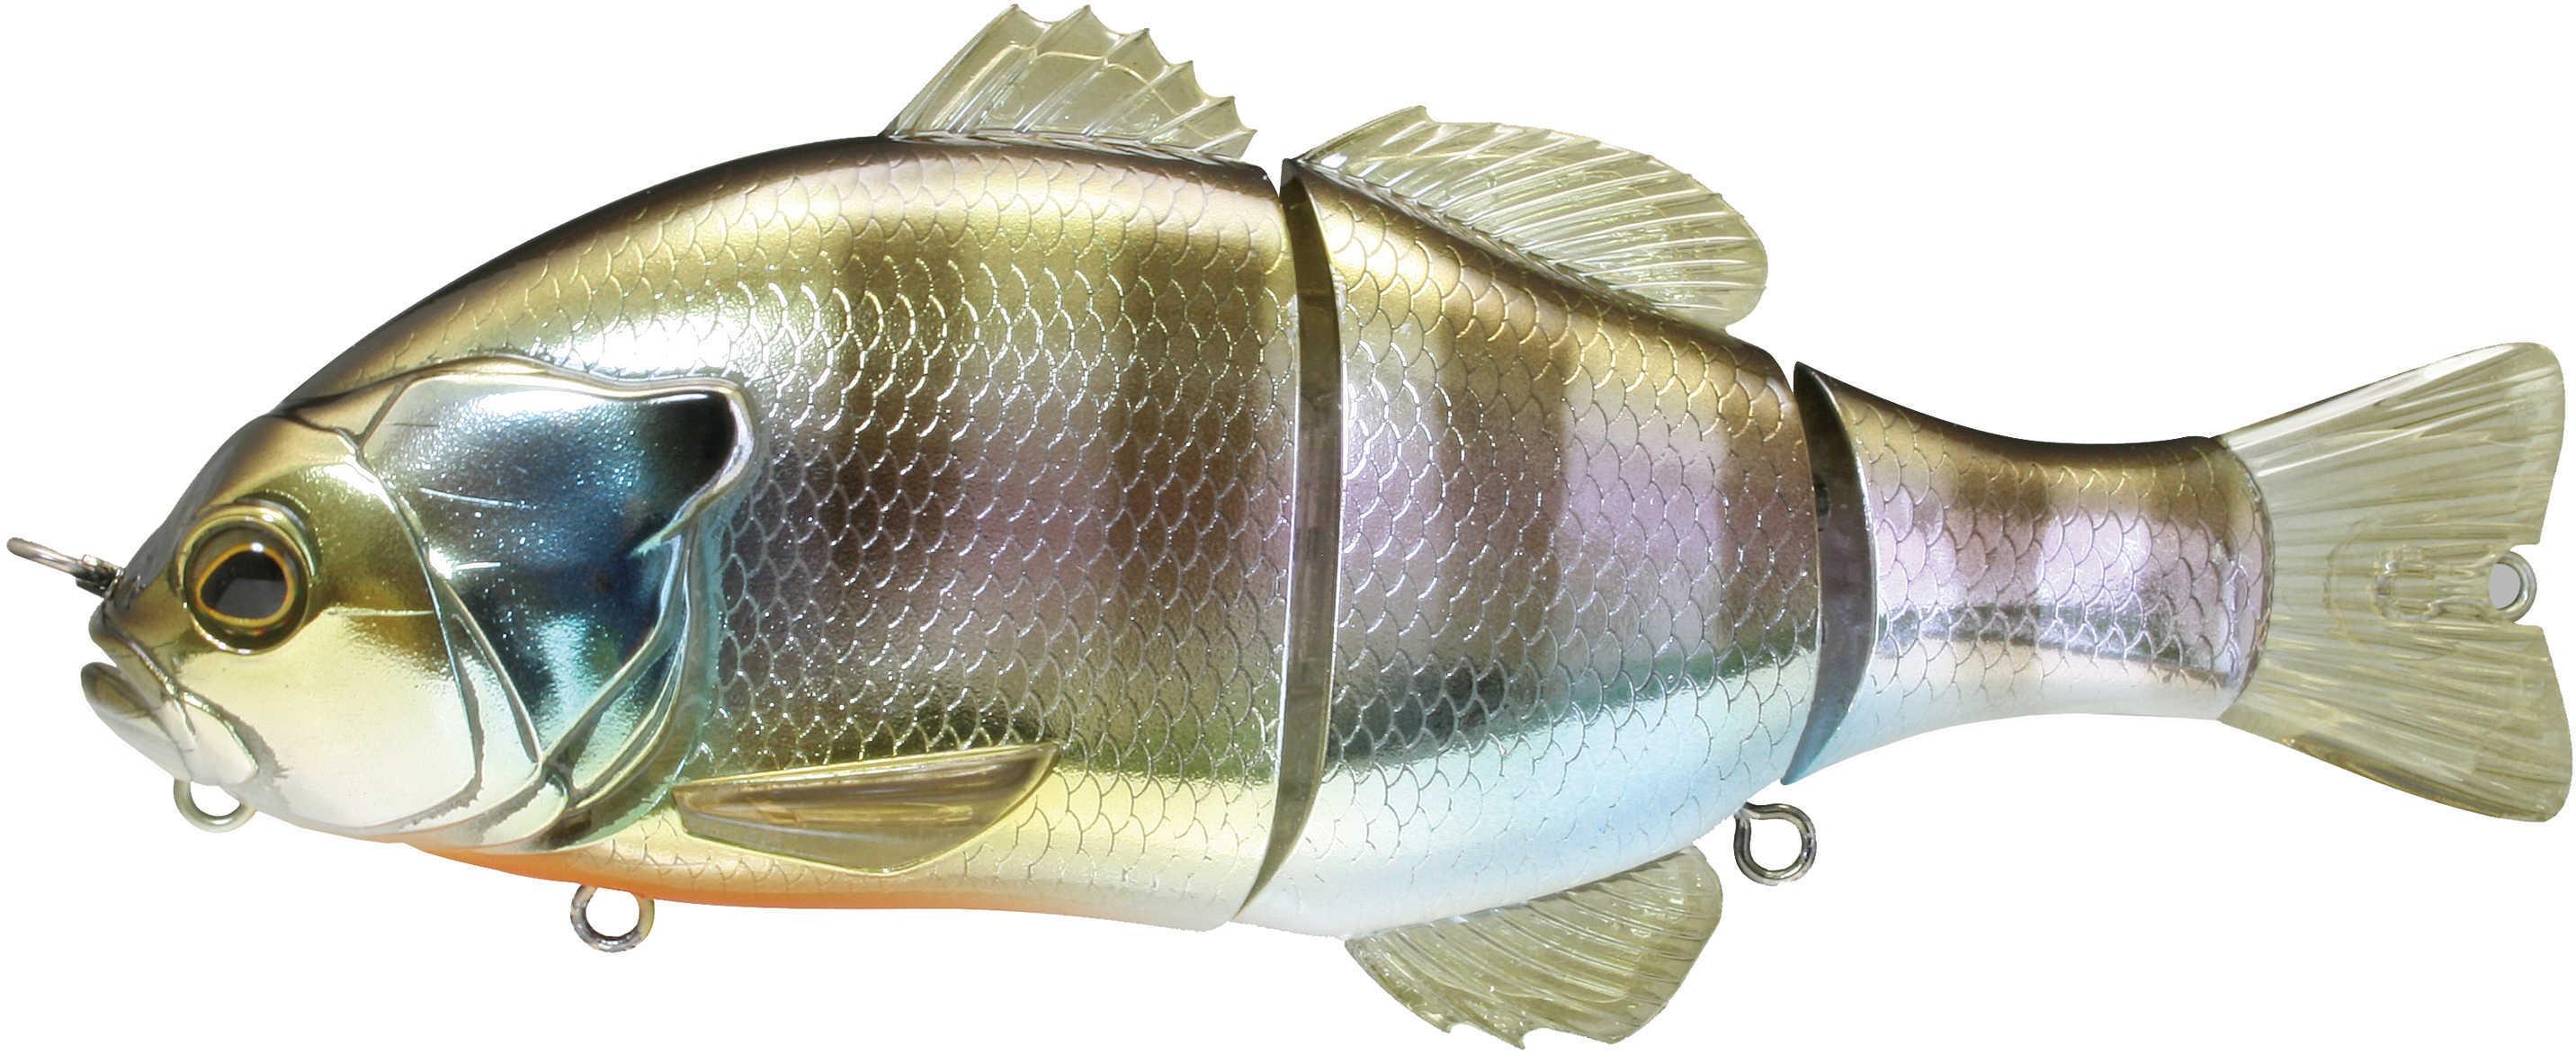 "Jackall Lures Gantarel Swim Bait Hard Lure 6"" Body Length, 2.45 oz, HI Bluegill, Per 1 Md: JGANT-HLB"